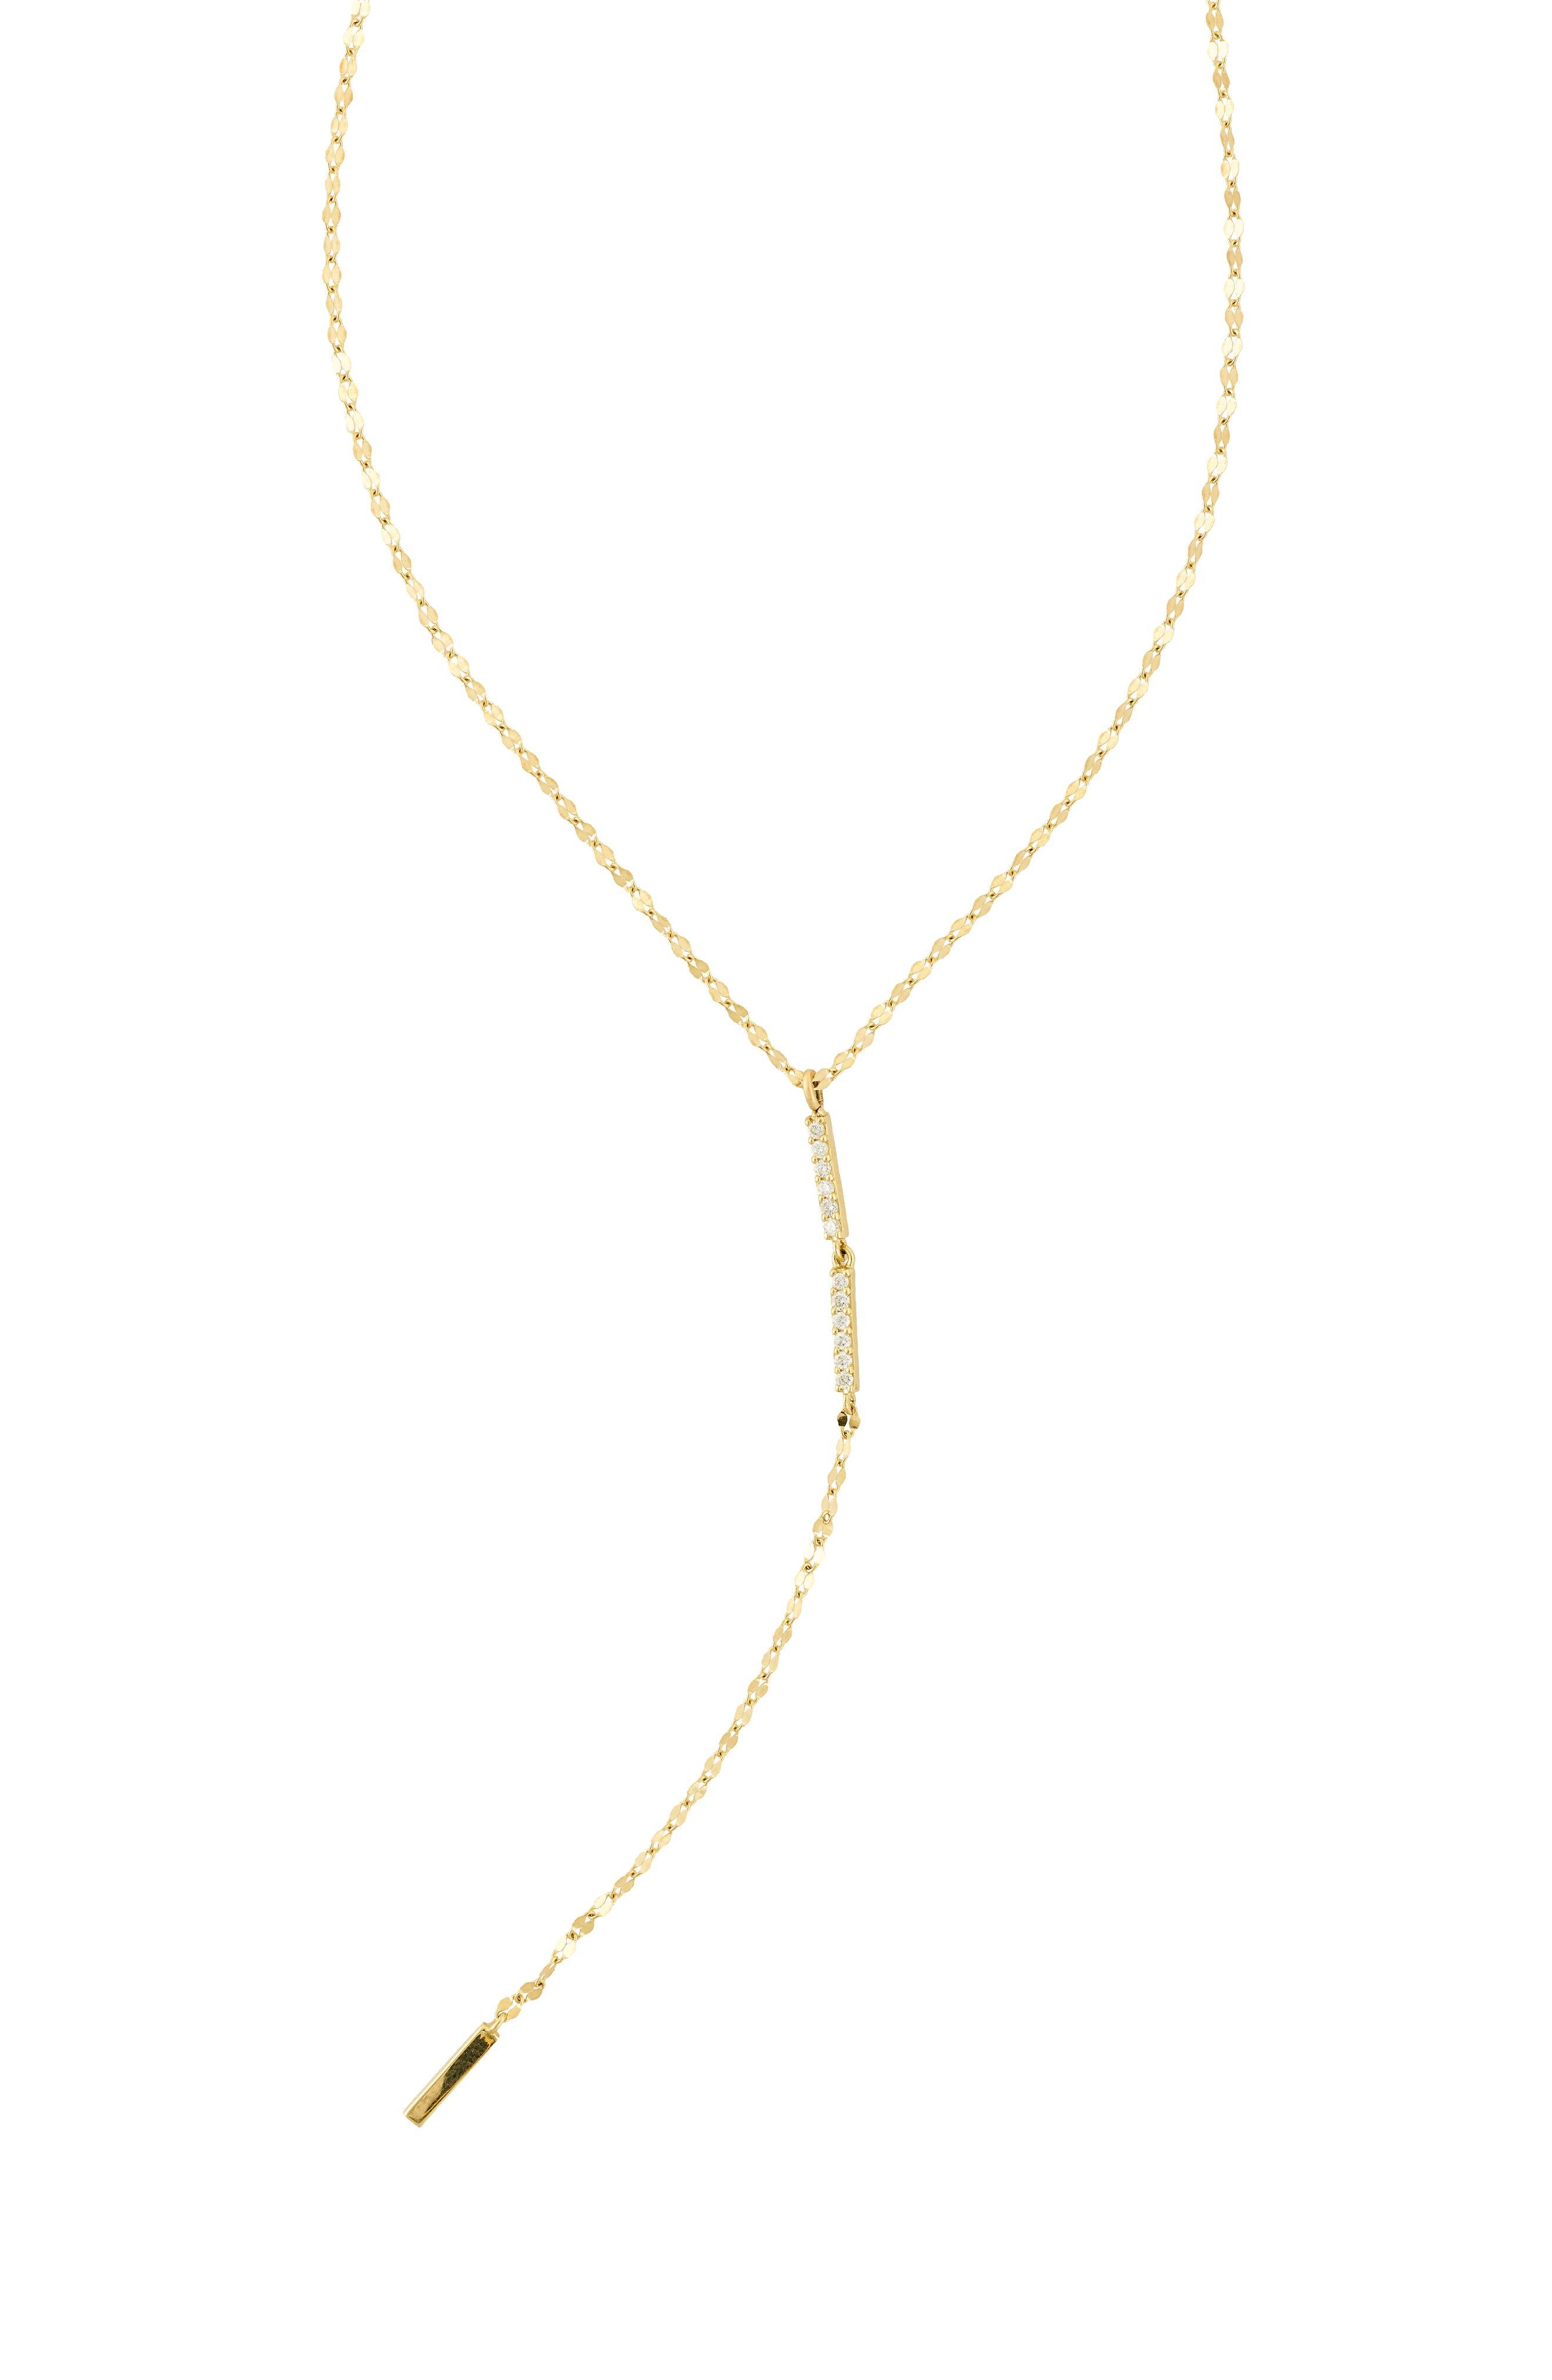 Diamond Bar Lariat Necklace,                         Main,                         color, Yellow Gold